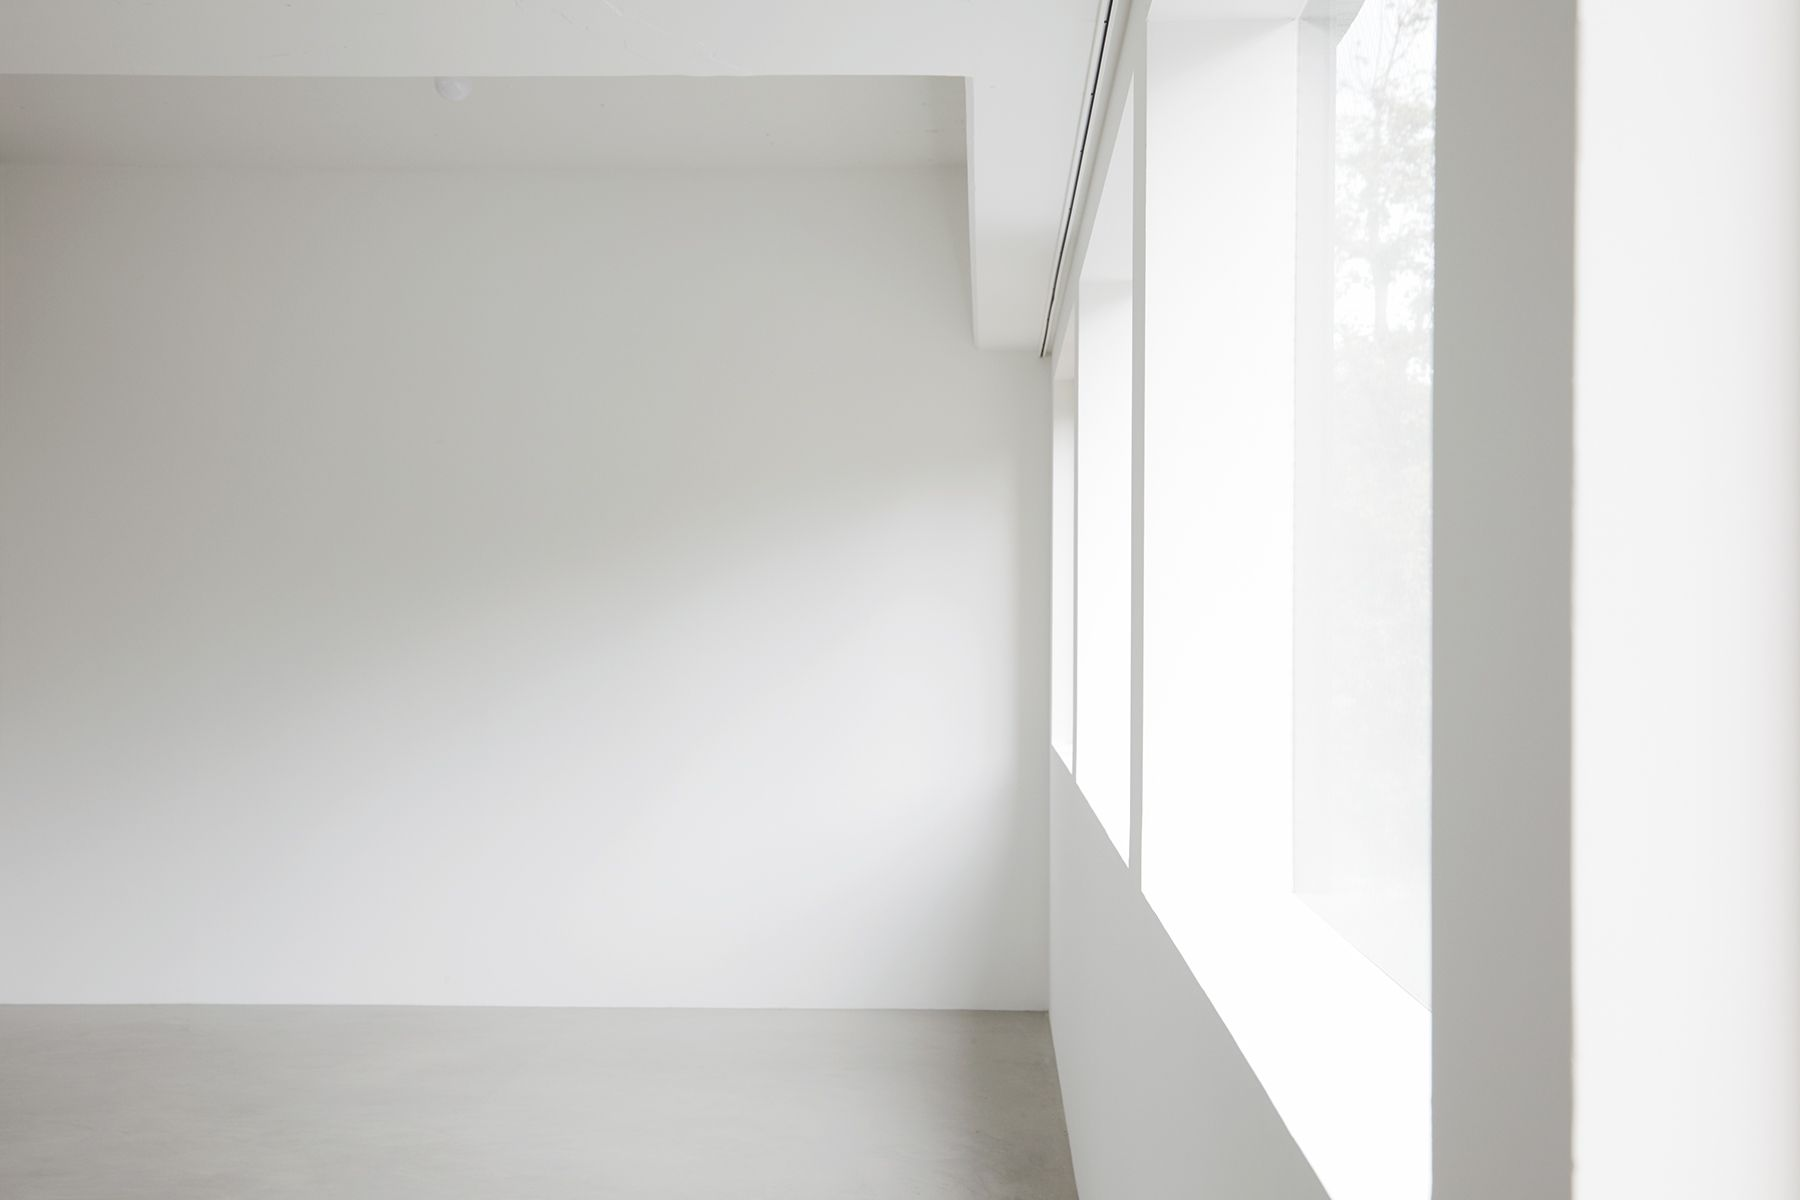 inTHE studio|yoyogi-park (インザスタジオ|ヨヨギパーク)